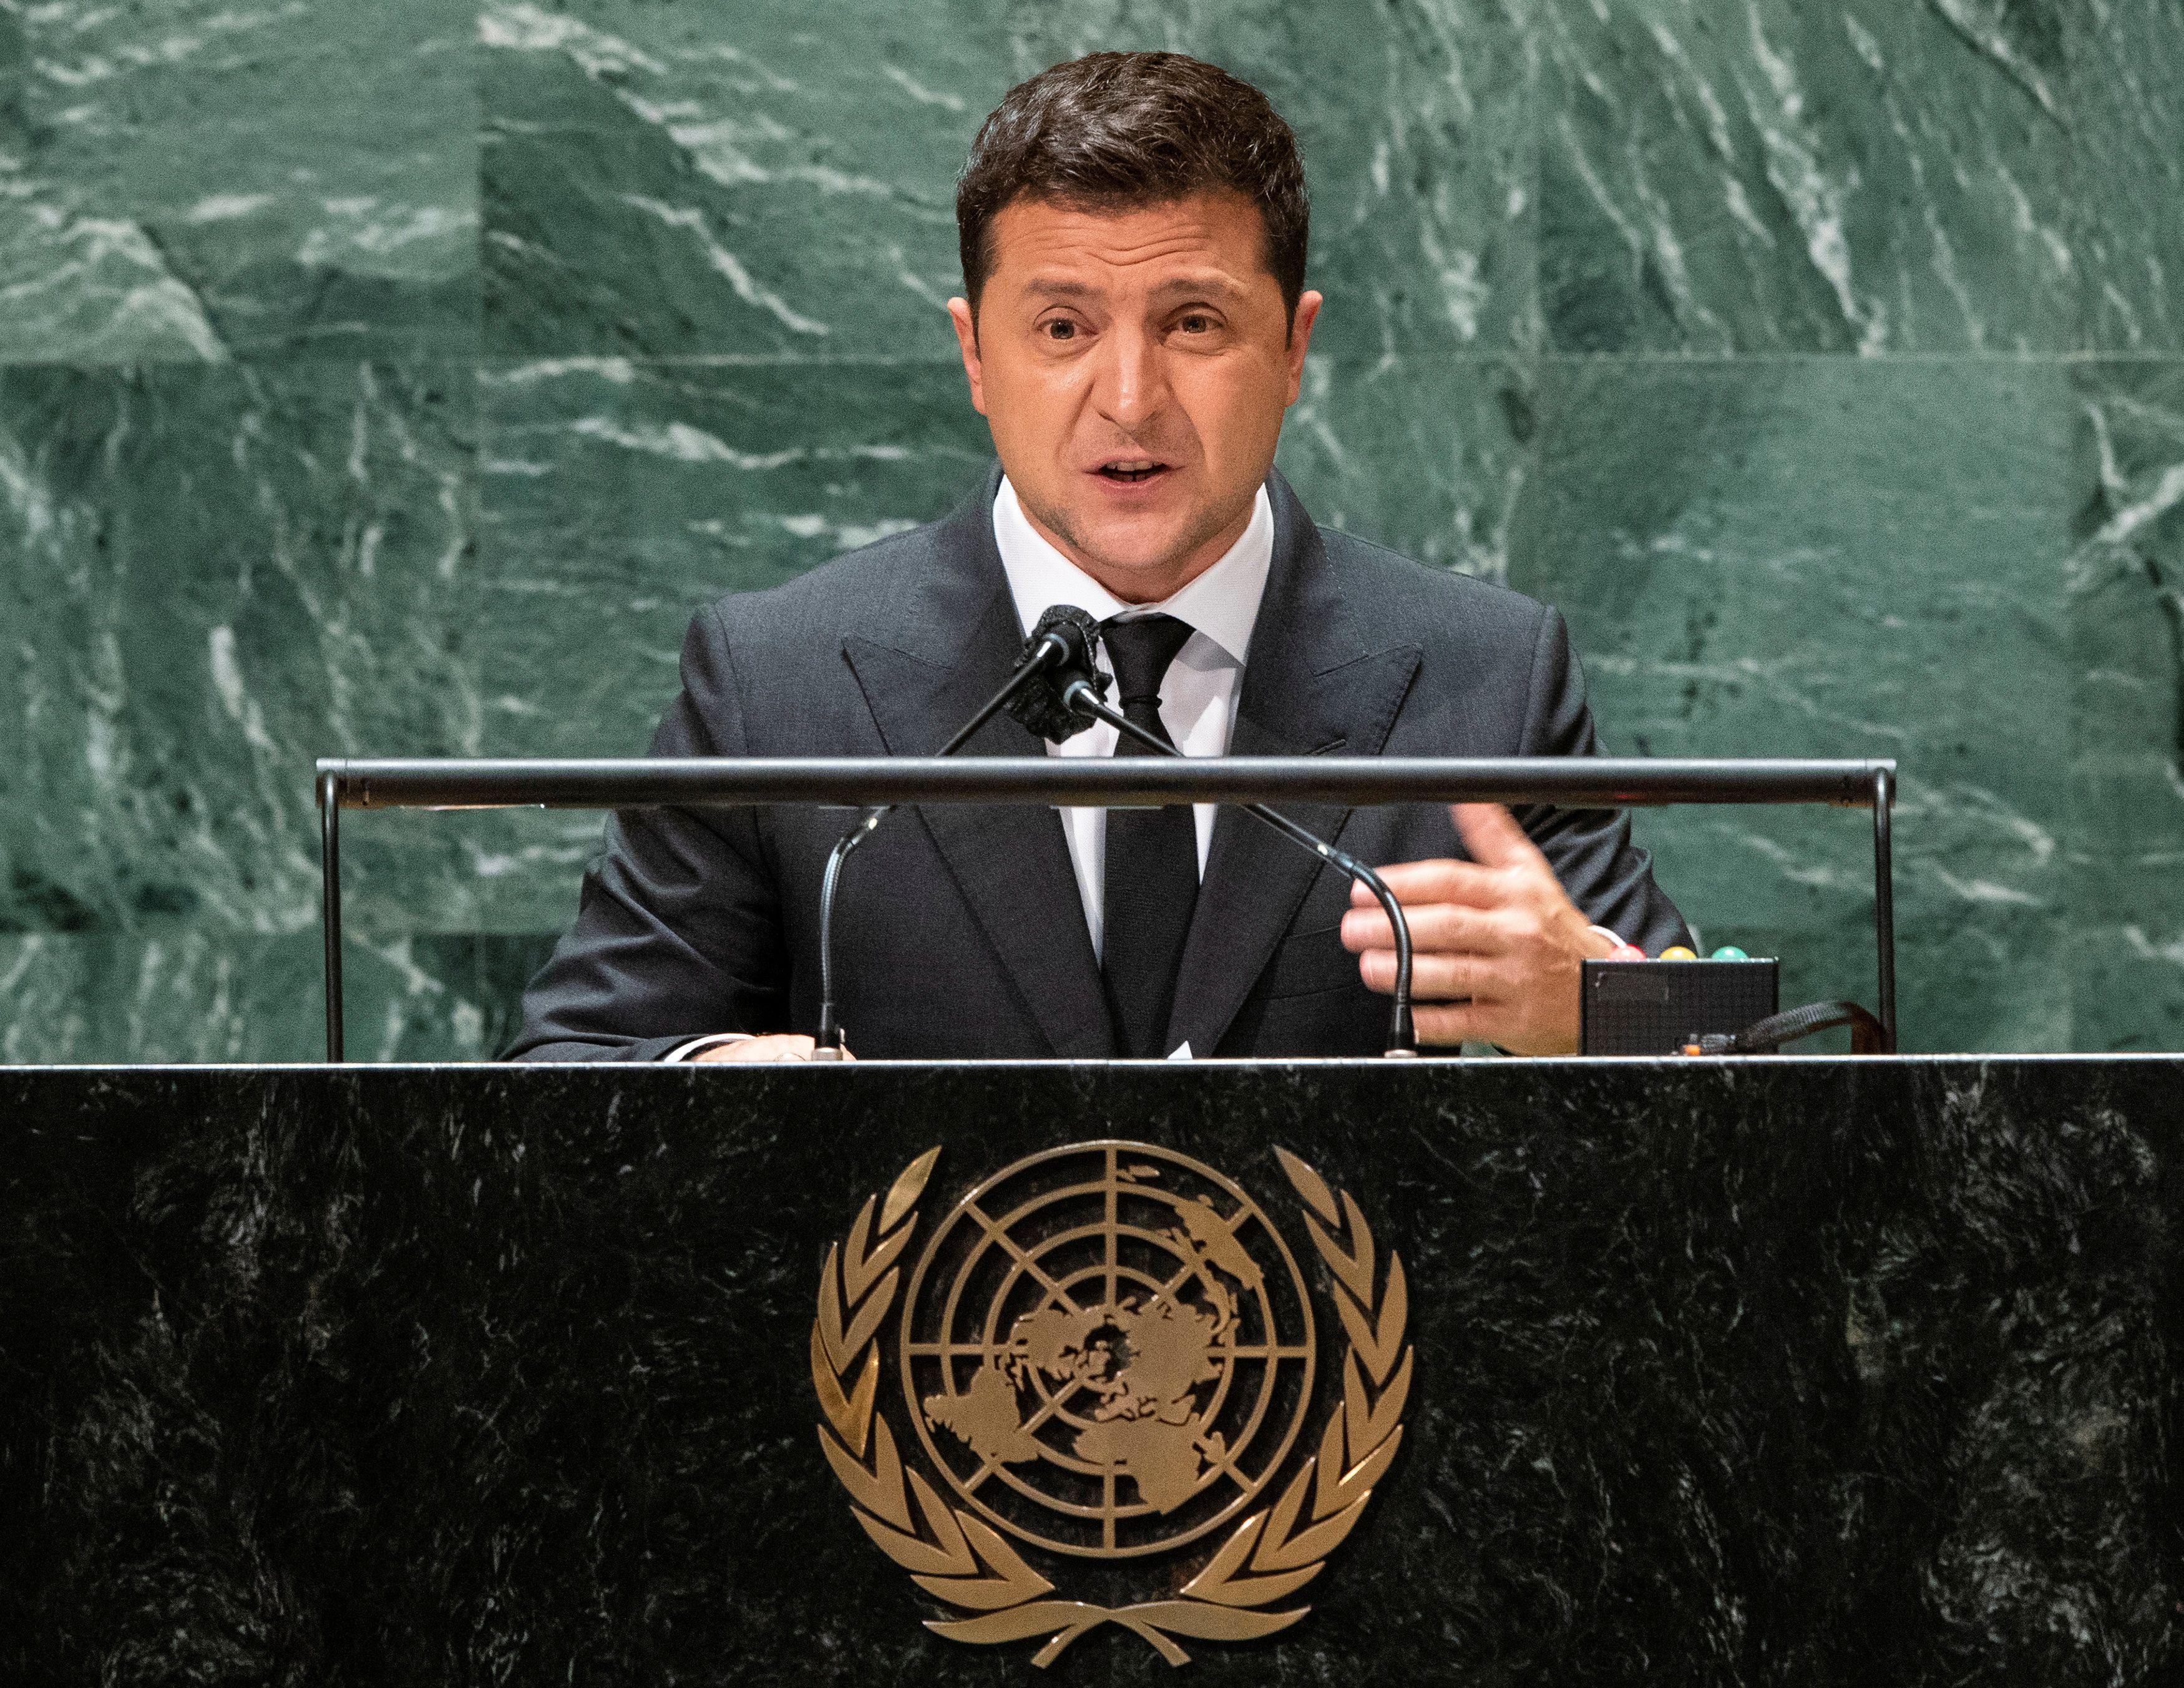 Ukraine's President Volodymyr Zelenskiy addresses the 76th Session of the U.N. General Assembly in New York City, U.S., September 22, 2021.  REUTERS/Eduardo Munoz/Pool